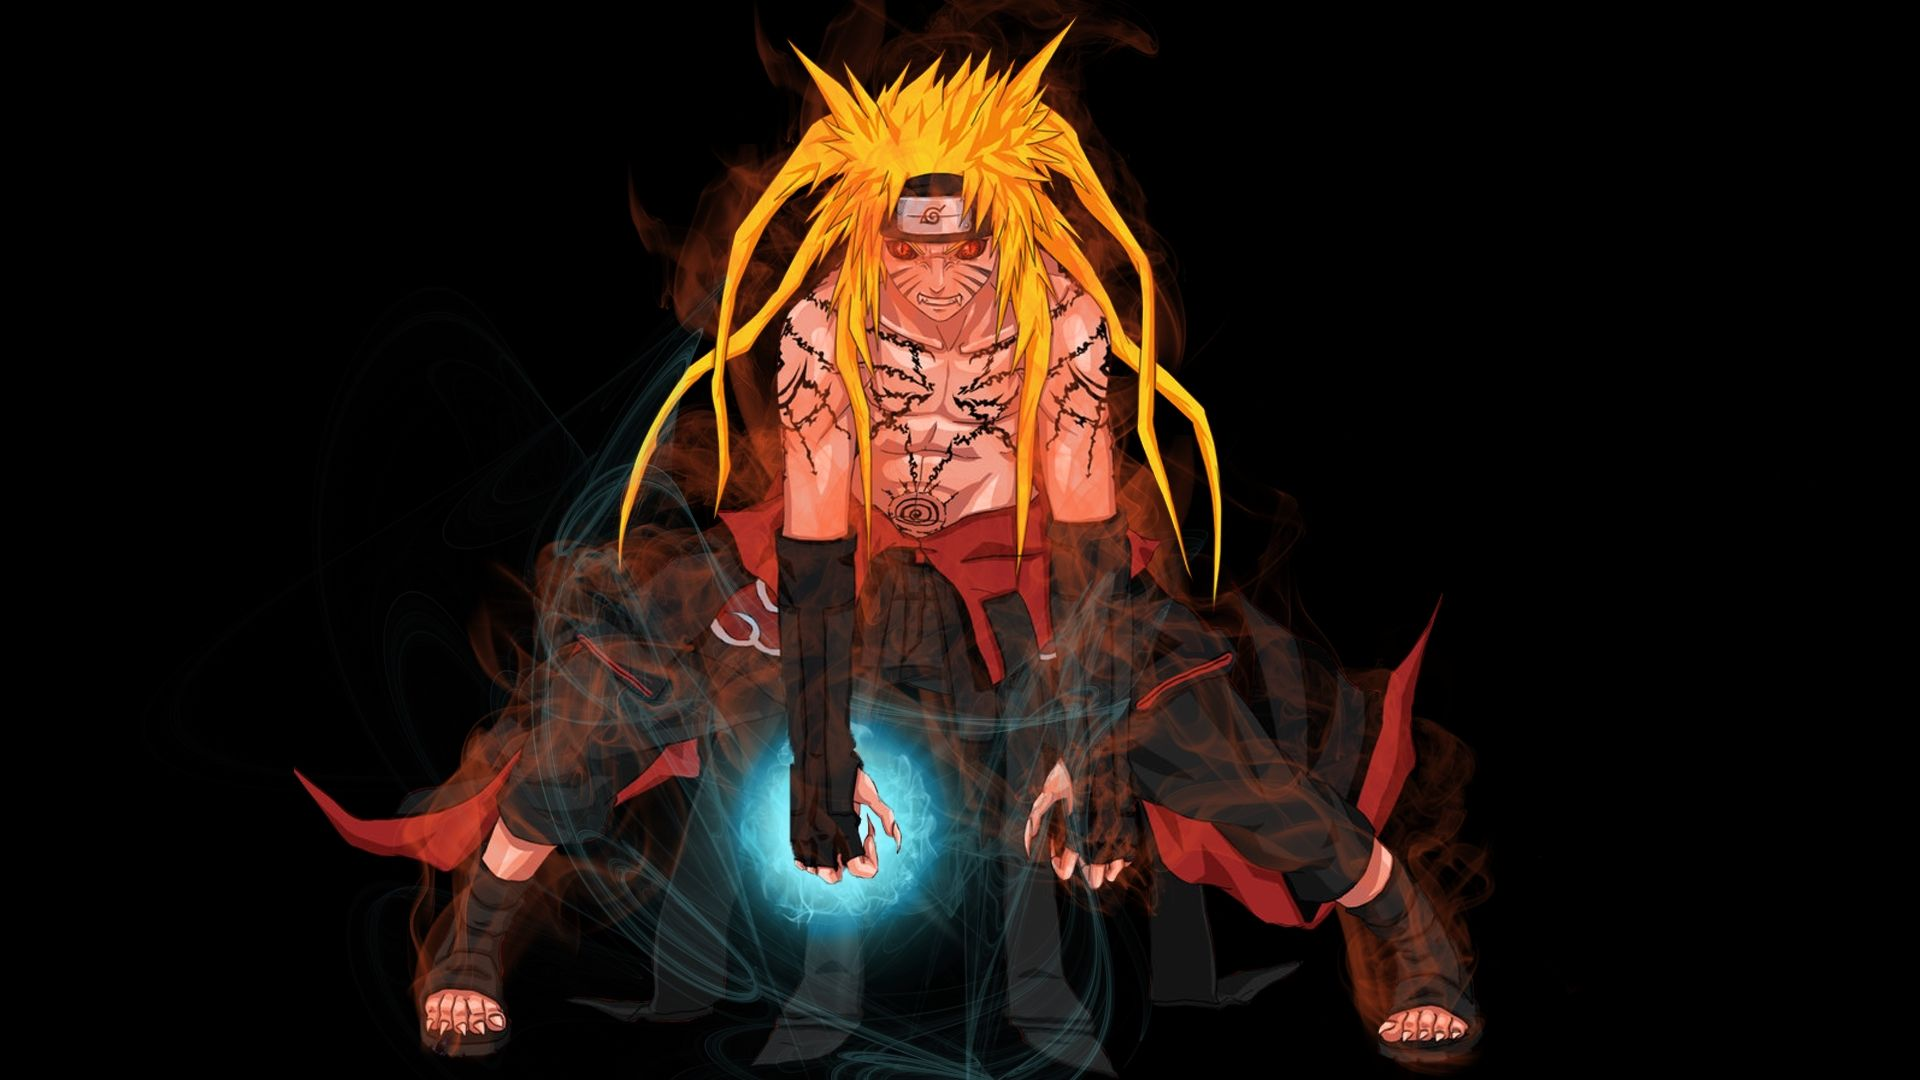 Naruto And Sasuke art, Free Wallpaper